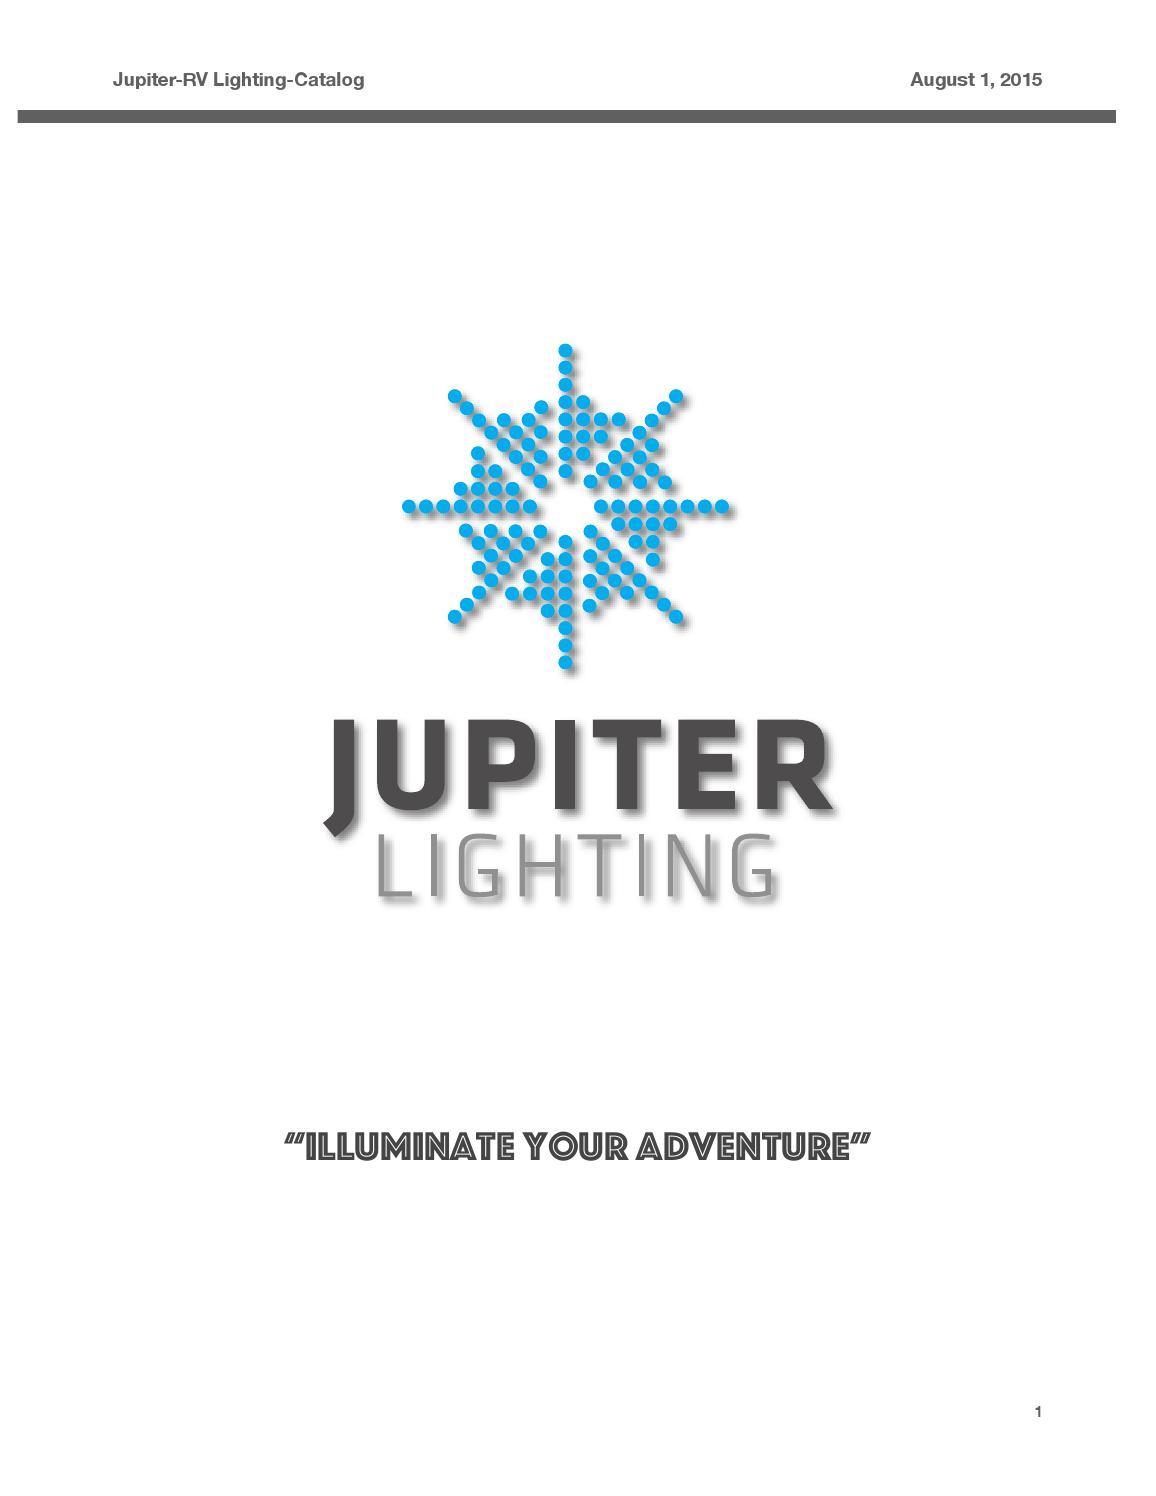 sc 1 st  Issuu & Jupiter Lighting: 2015 Catalog by Jupiter LED Lighting - issuu azcodes.com